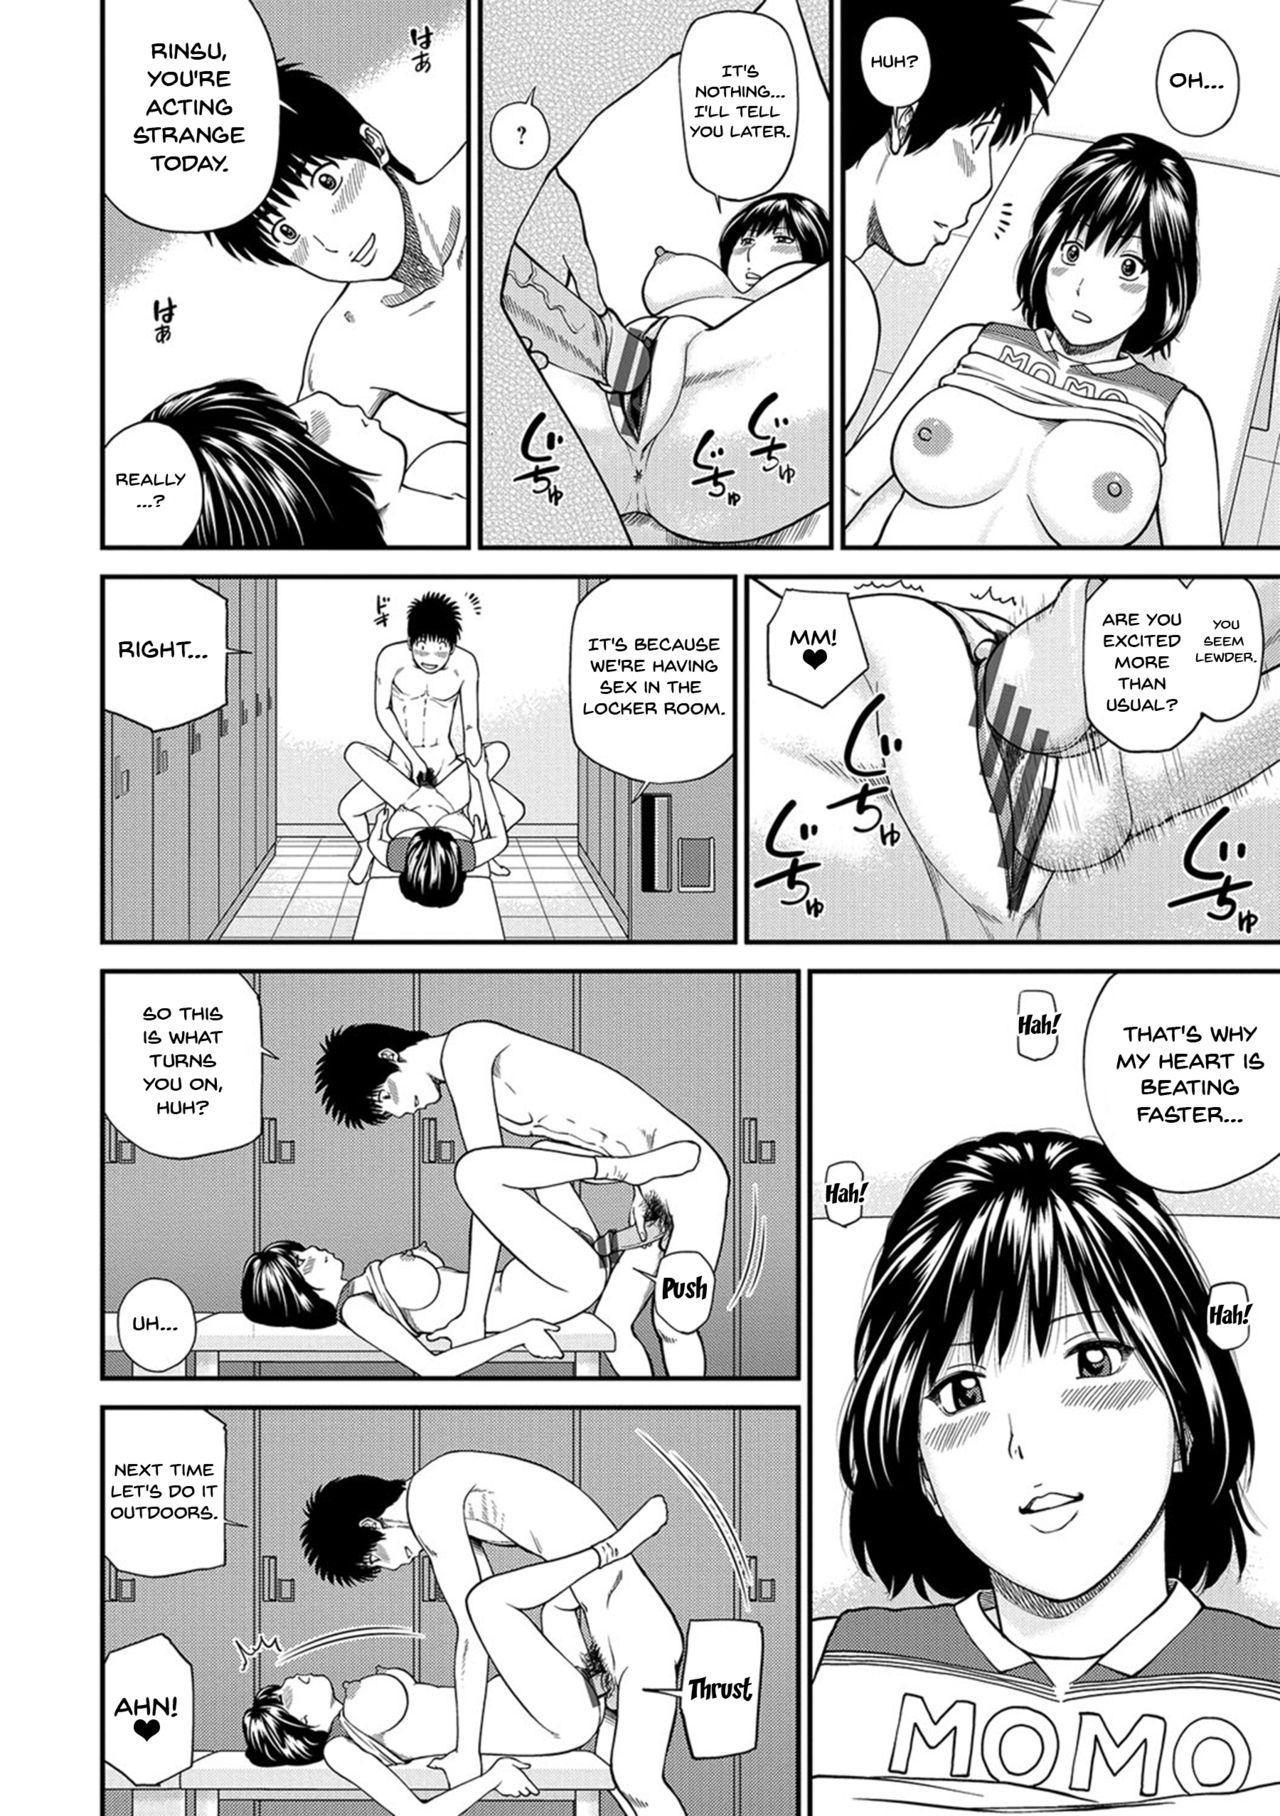 [Kuroki Hidehiko] Momojiri Danchi Mama-san Volley Doukoukai - Mom's Volley Ball | Momojiri District Mature Women's Volleyball Club Ch.1-9 [English] {Doujins.com} [Digital] 148